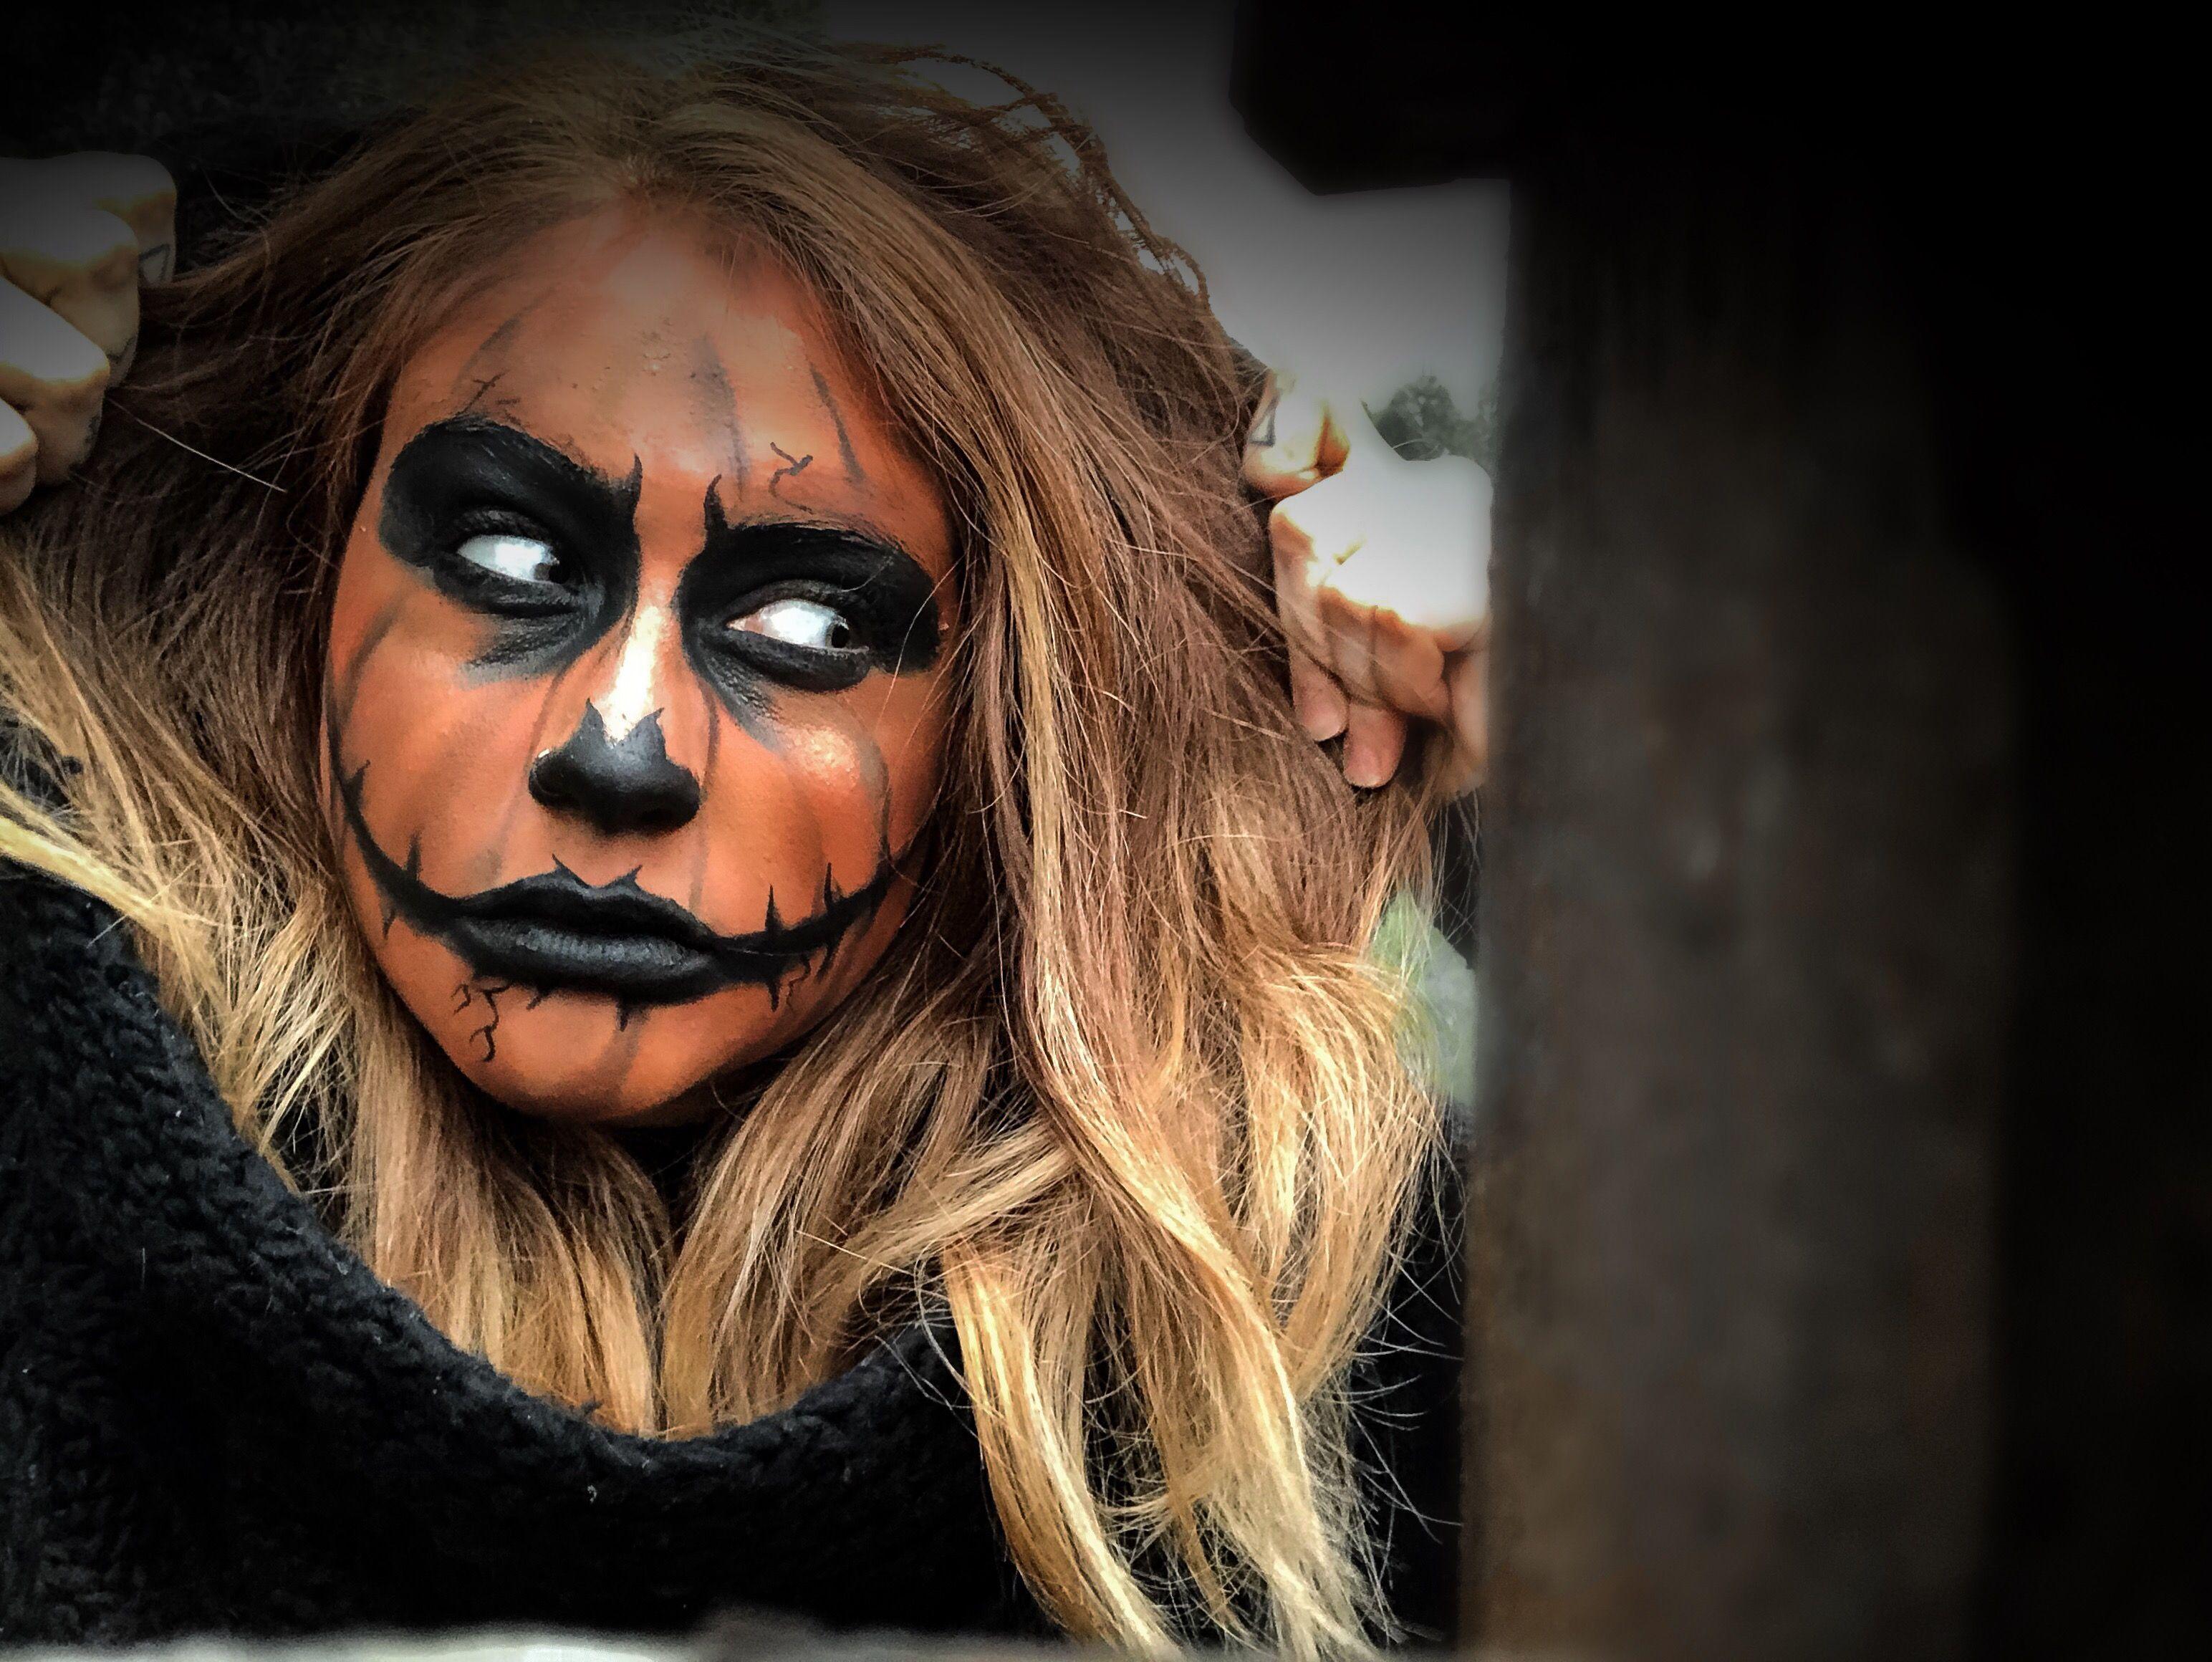 Halloween Looks Scary.Halloween Scary Evil Pumpkin Face Paint Makeup Look